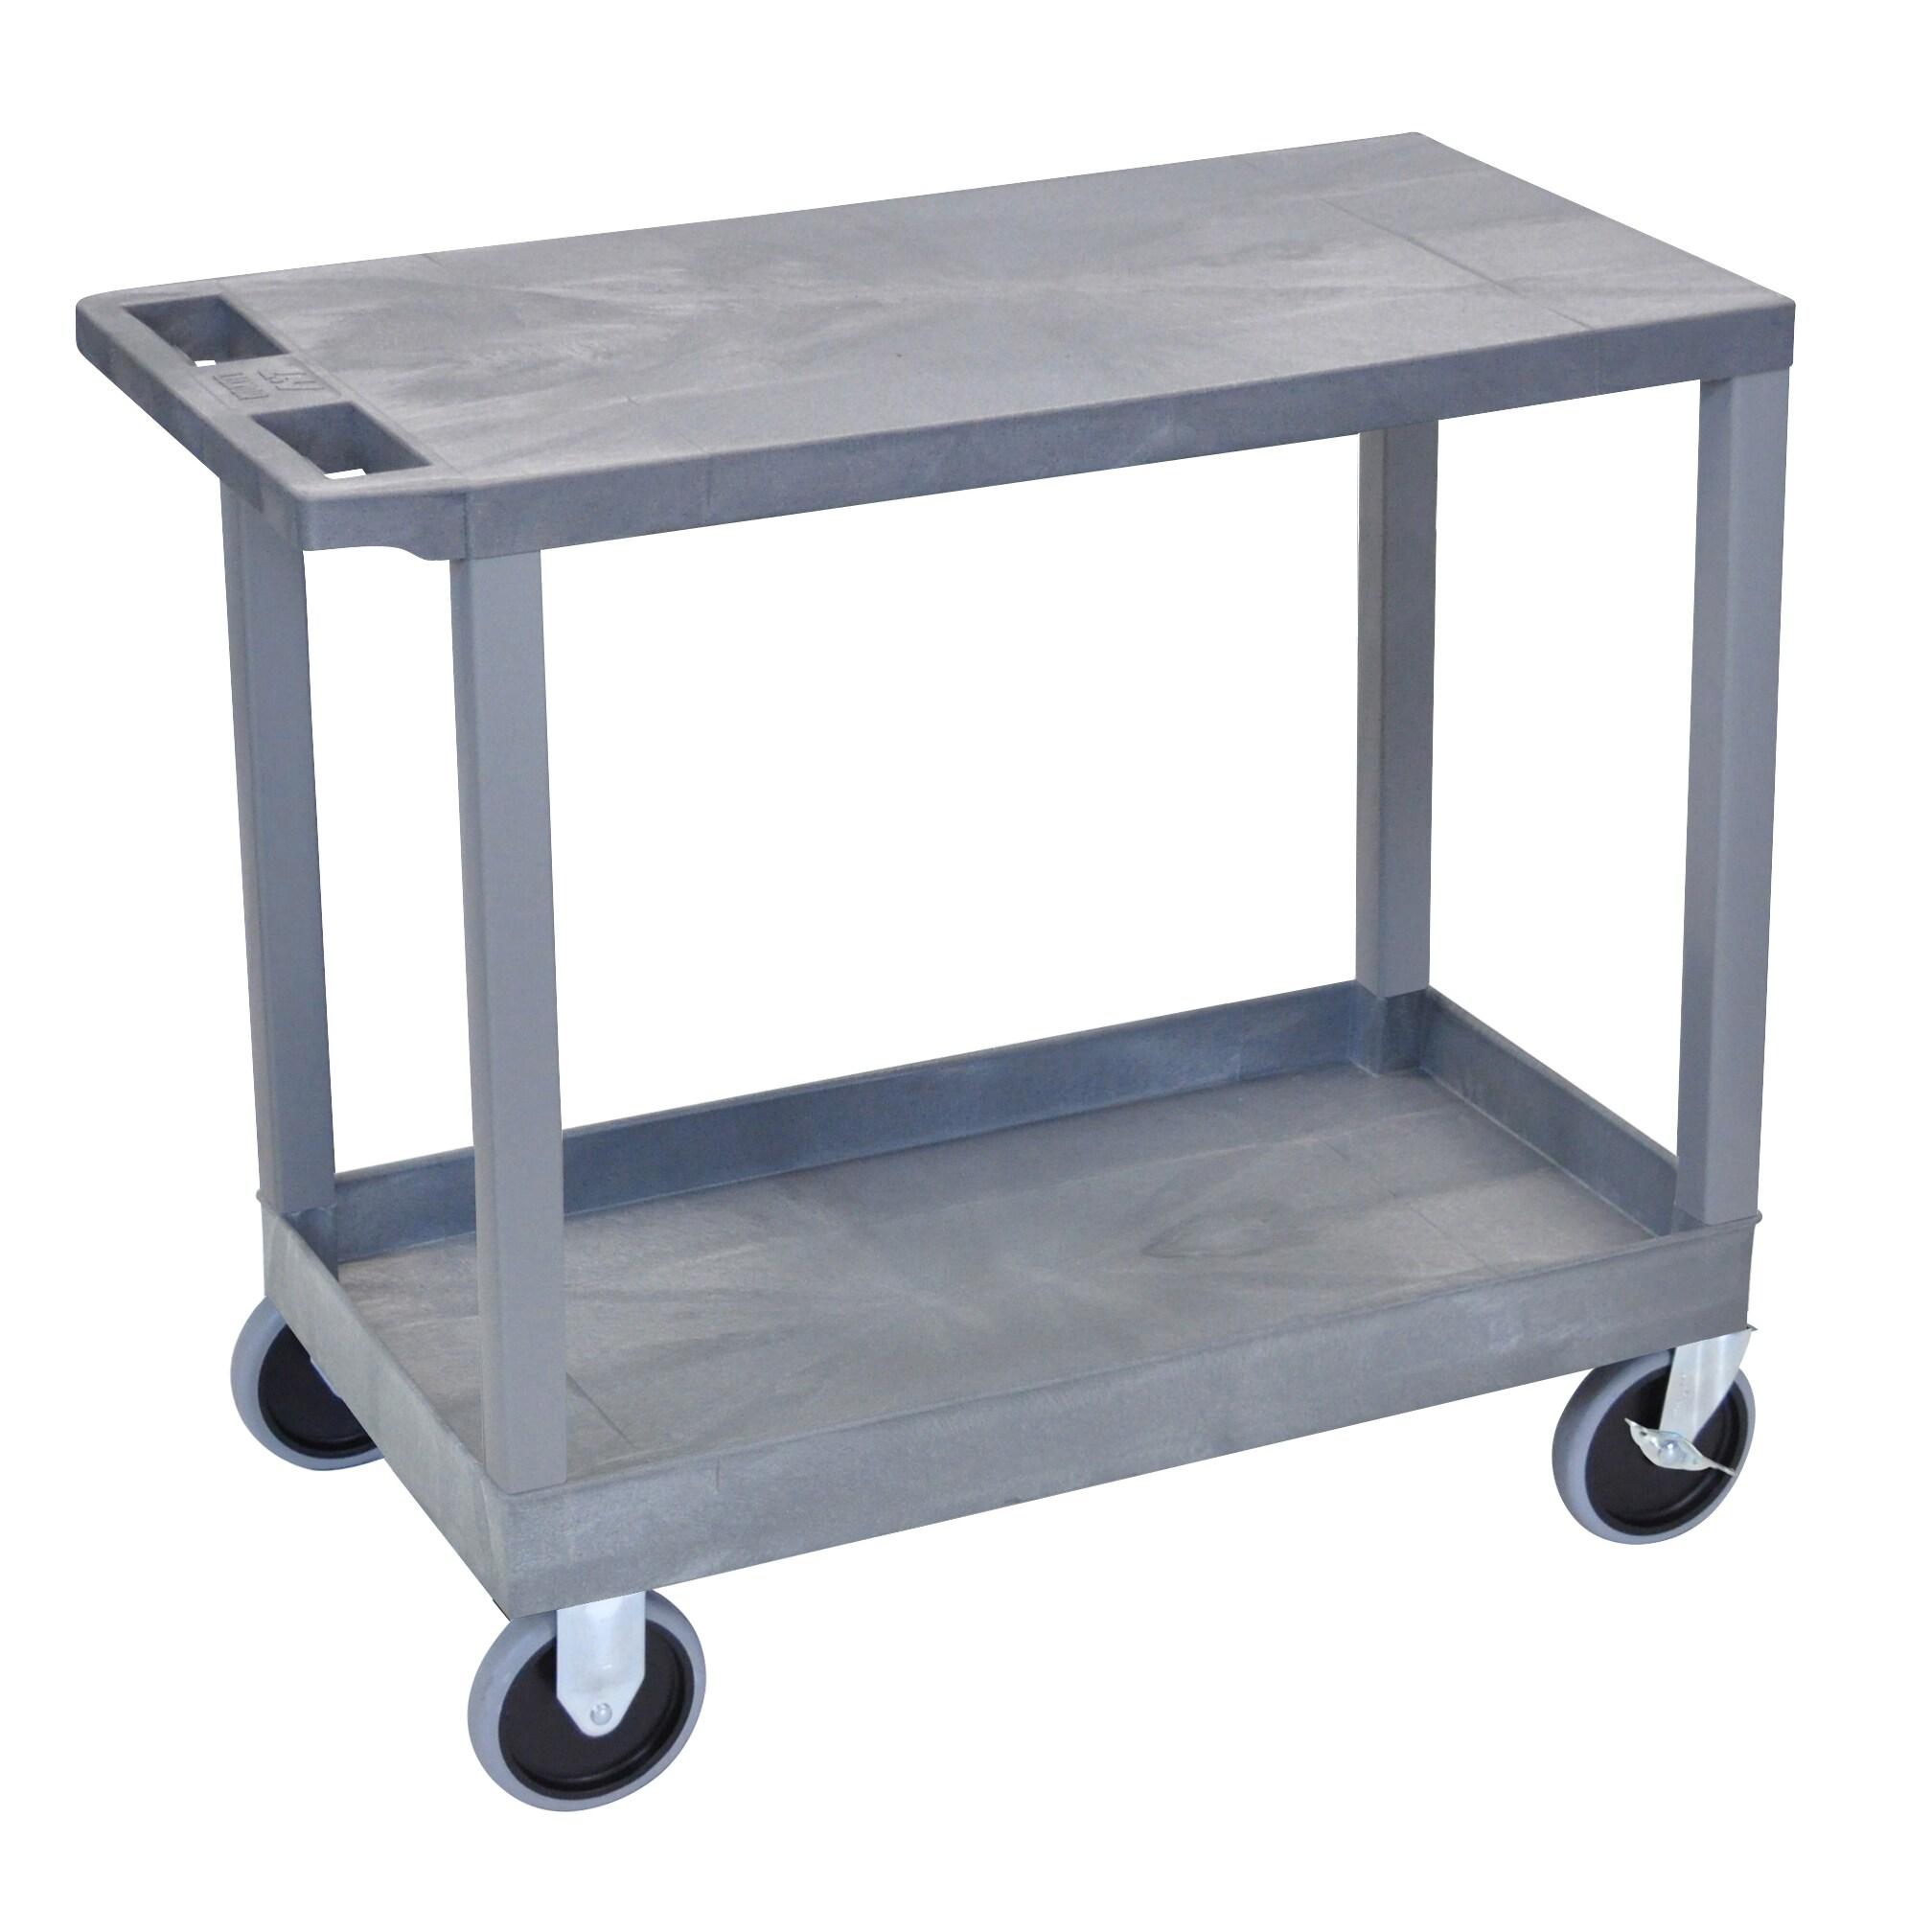 Luxor Plastic Grey High Capacity 1-tub Shelf 1-flat Shelf Cart